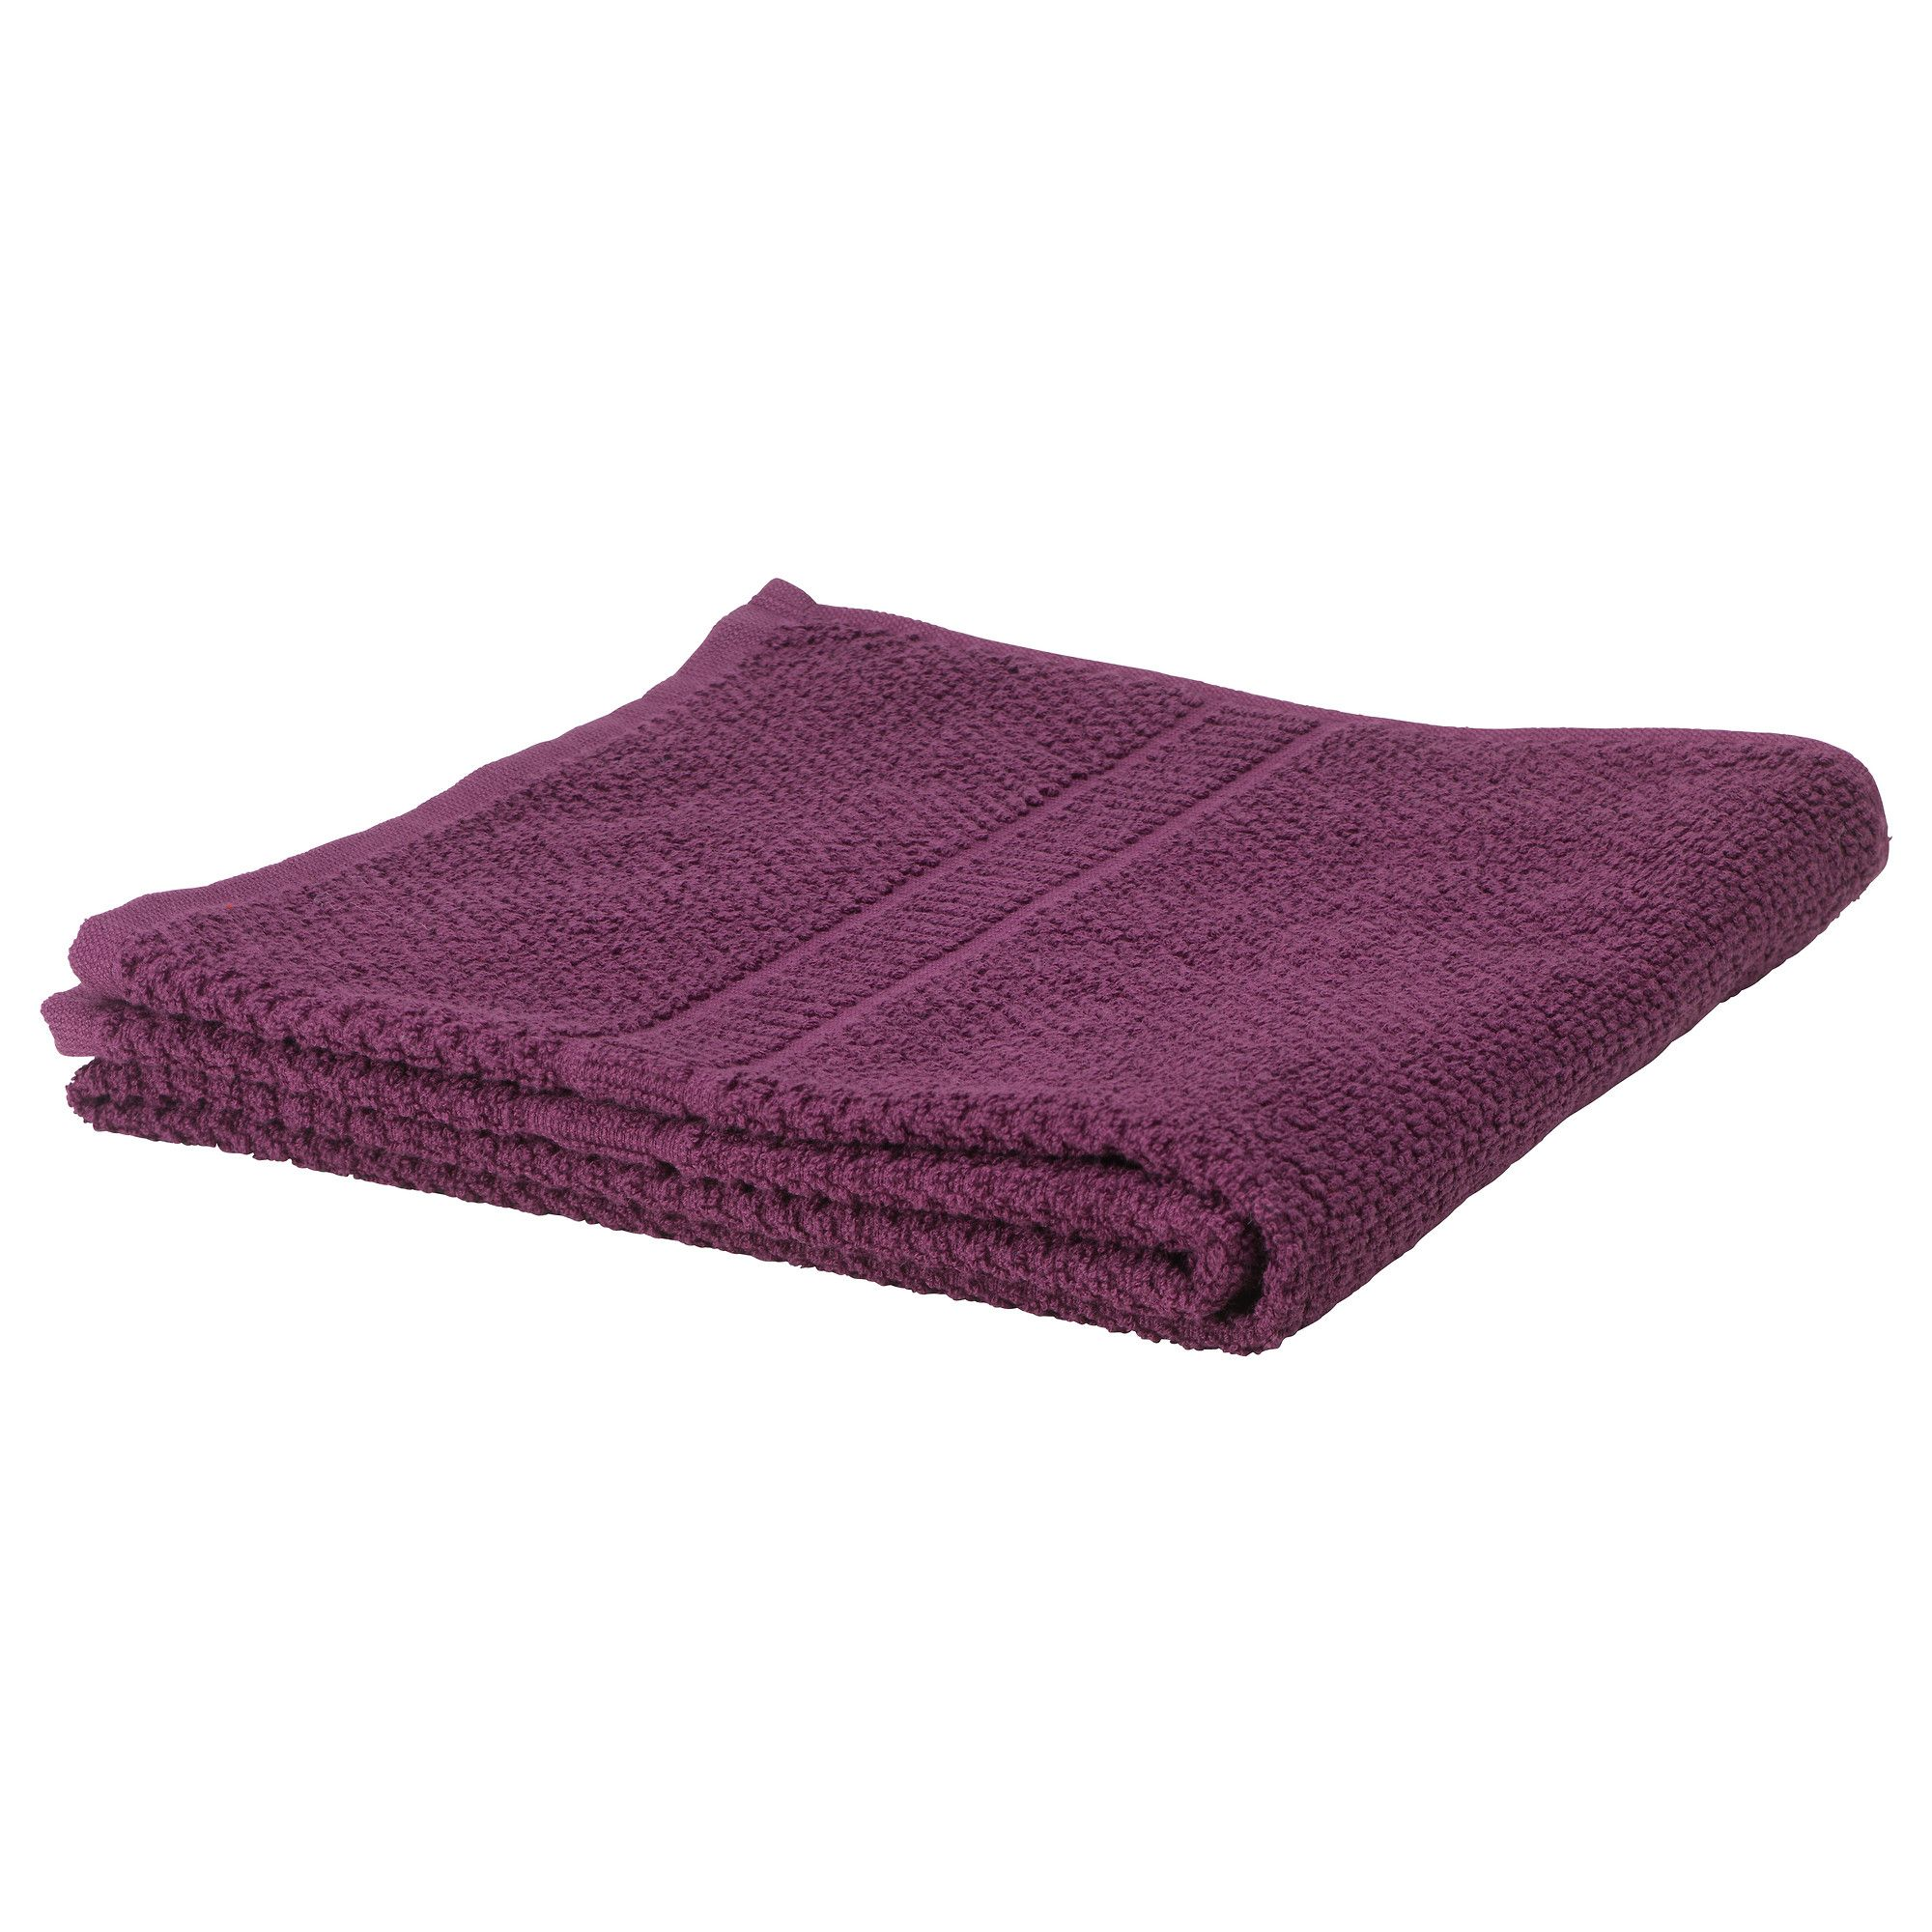 What Is A Bath Sheet Fräjen Bath Sheet Dark Lilac $999  New Digs Possibilities